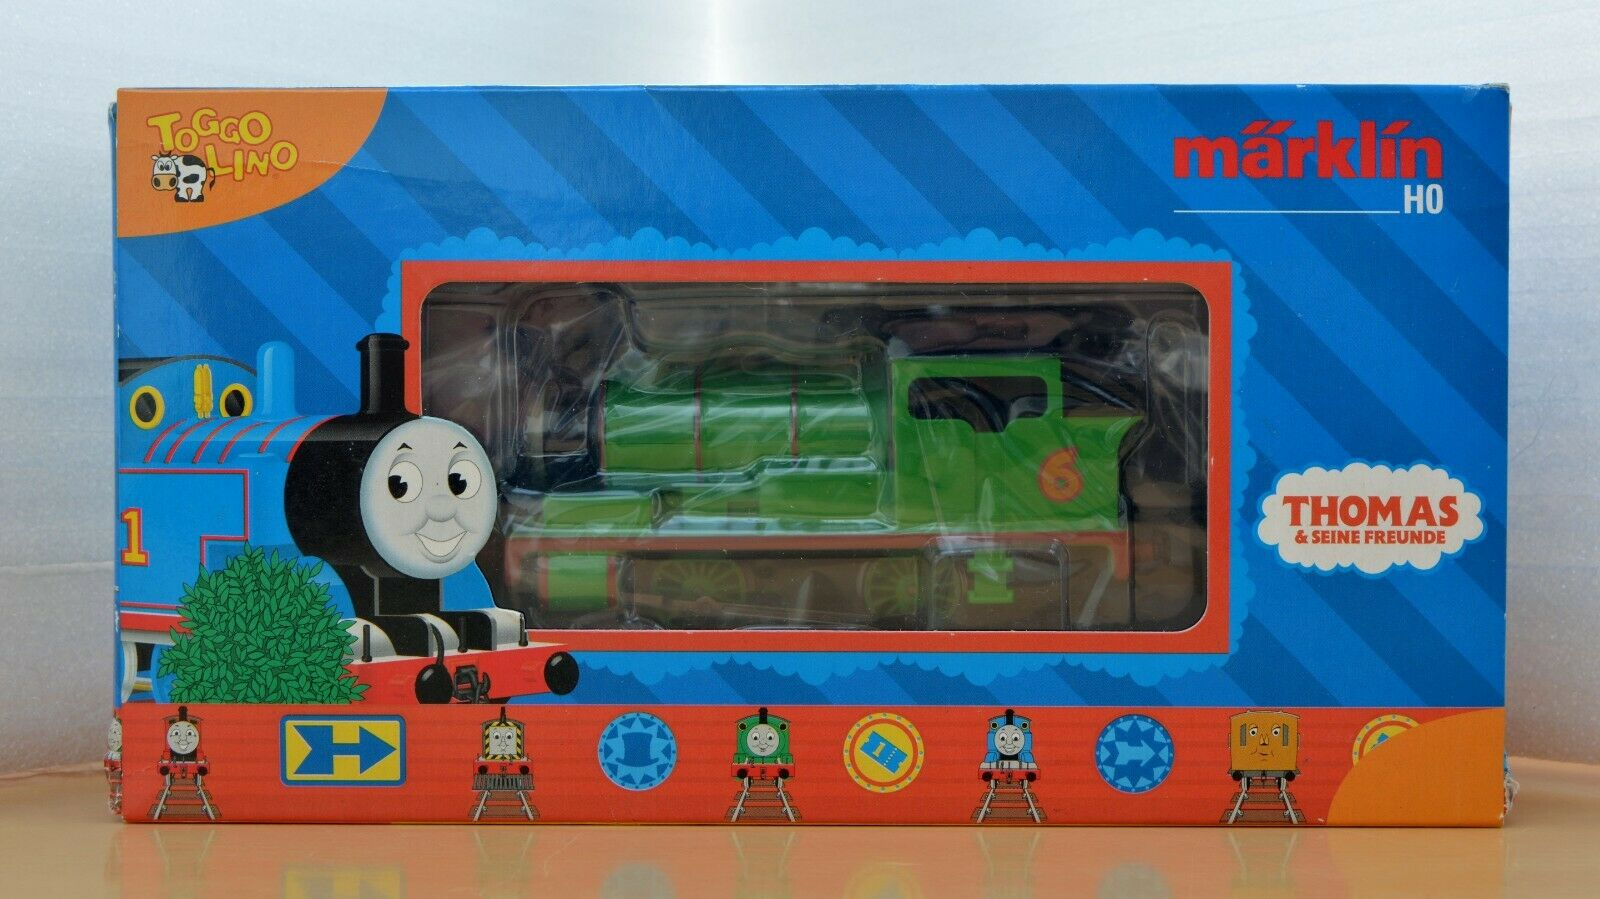 Märklin HO OO 36121  Percy  Steam Locomotive from Thomas And Friends